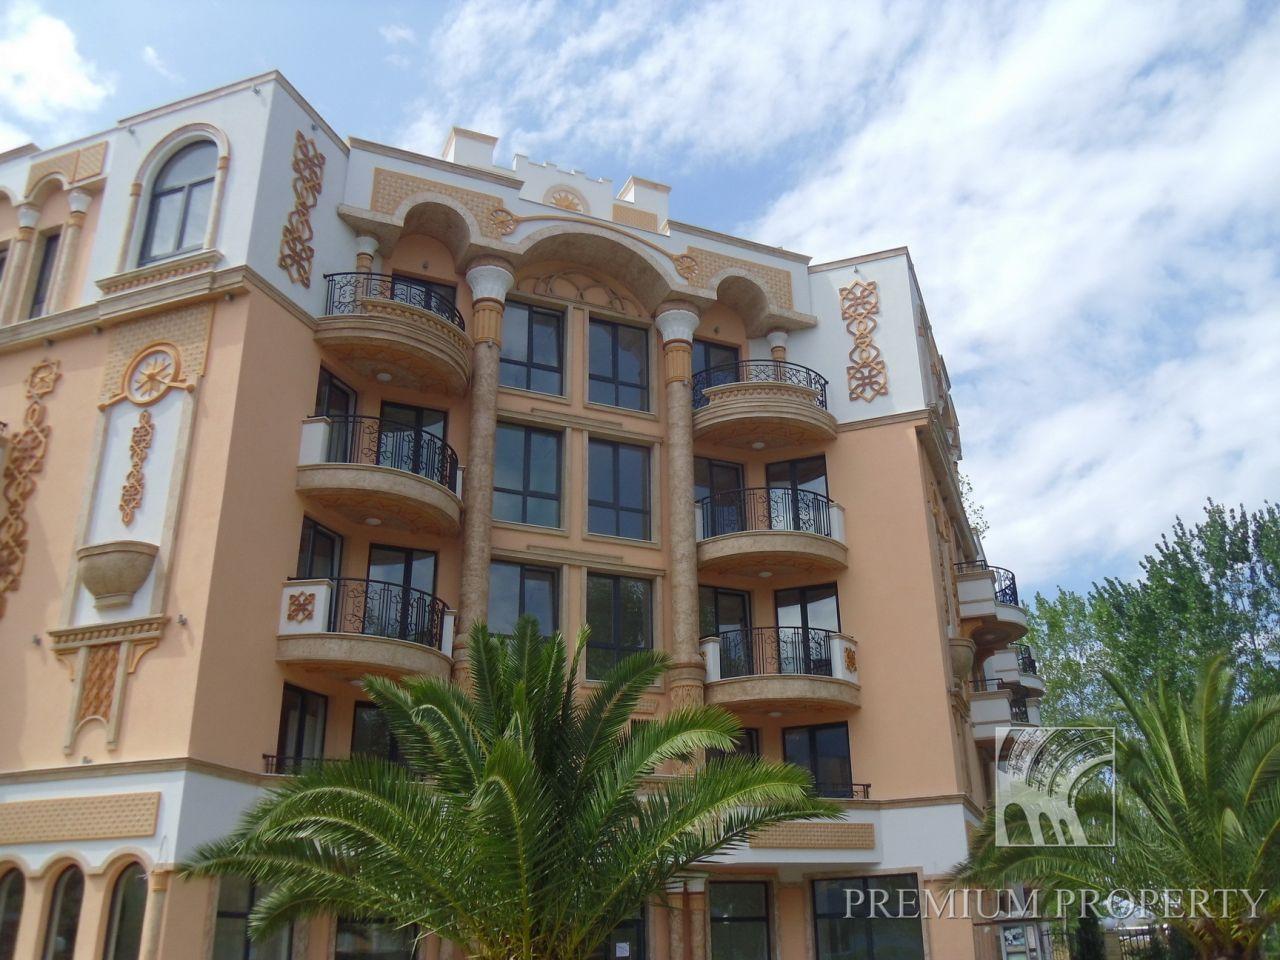 Апартаменты на Солнечном берегу, Болгария, 52.97 м2 - фото 1